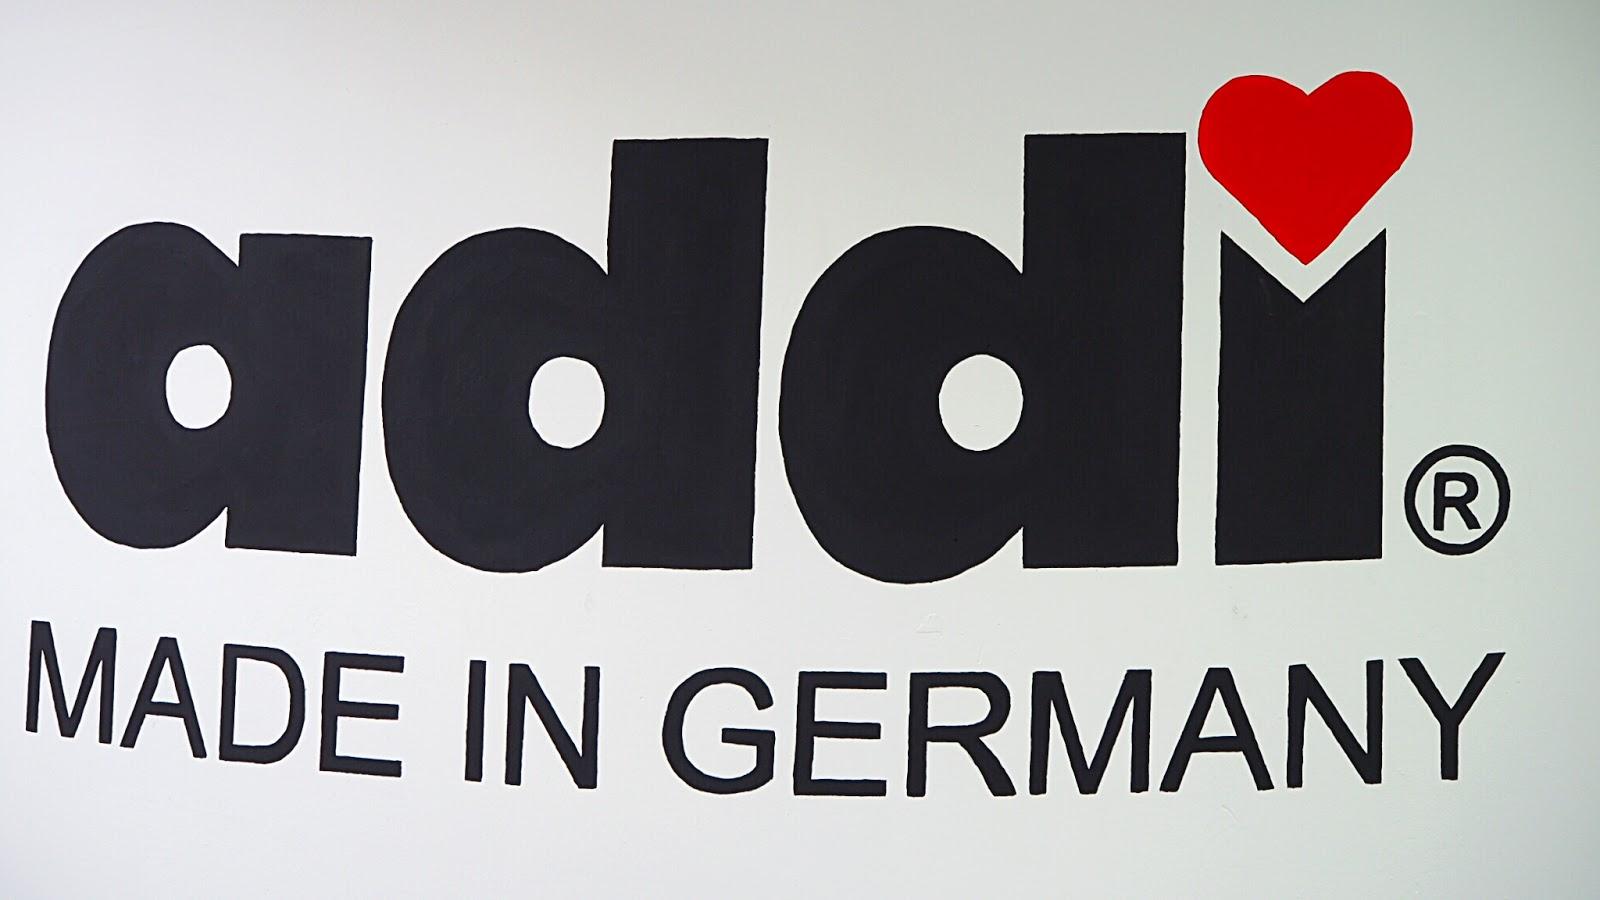 addi - made in Germany